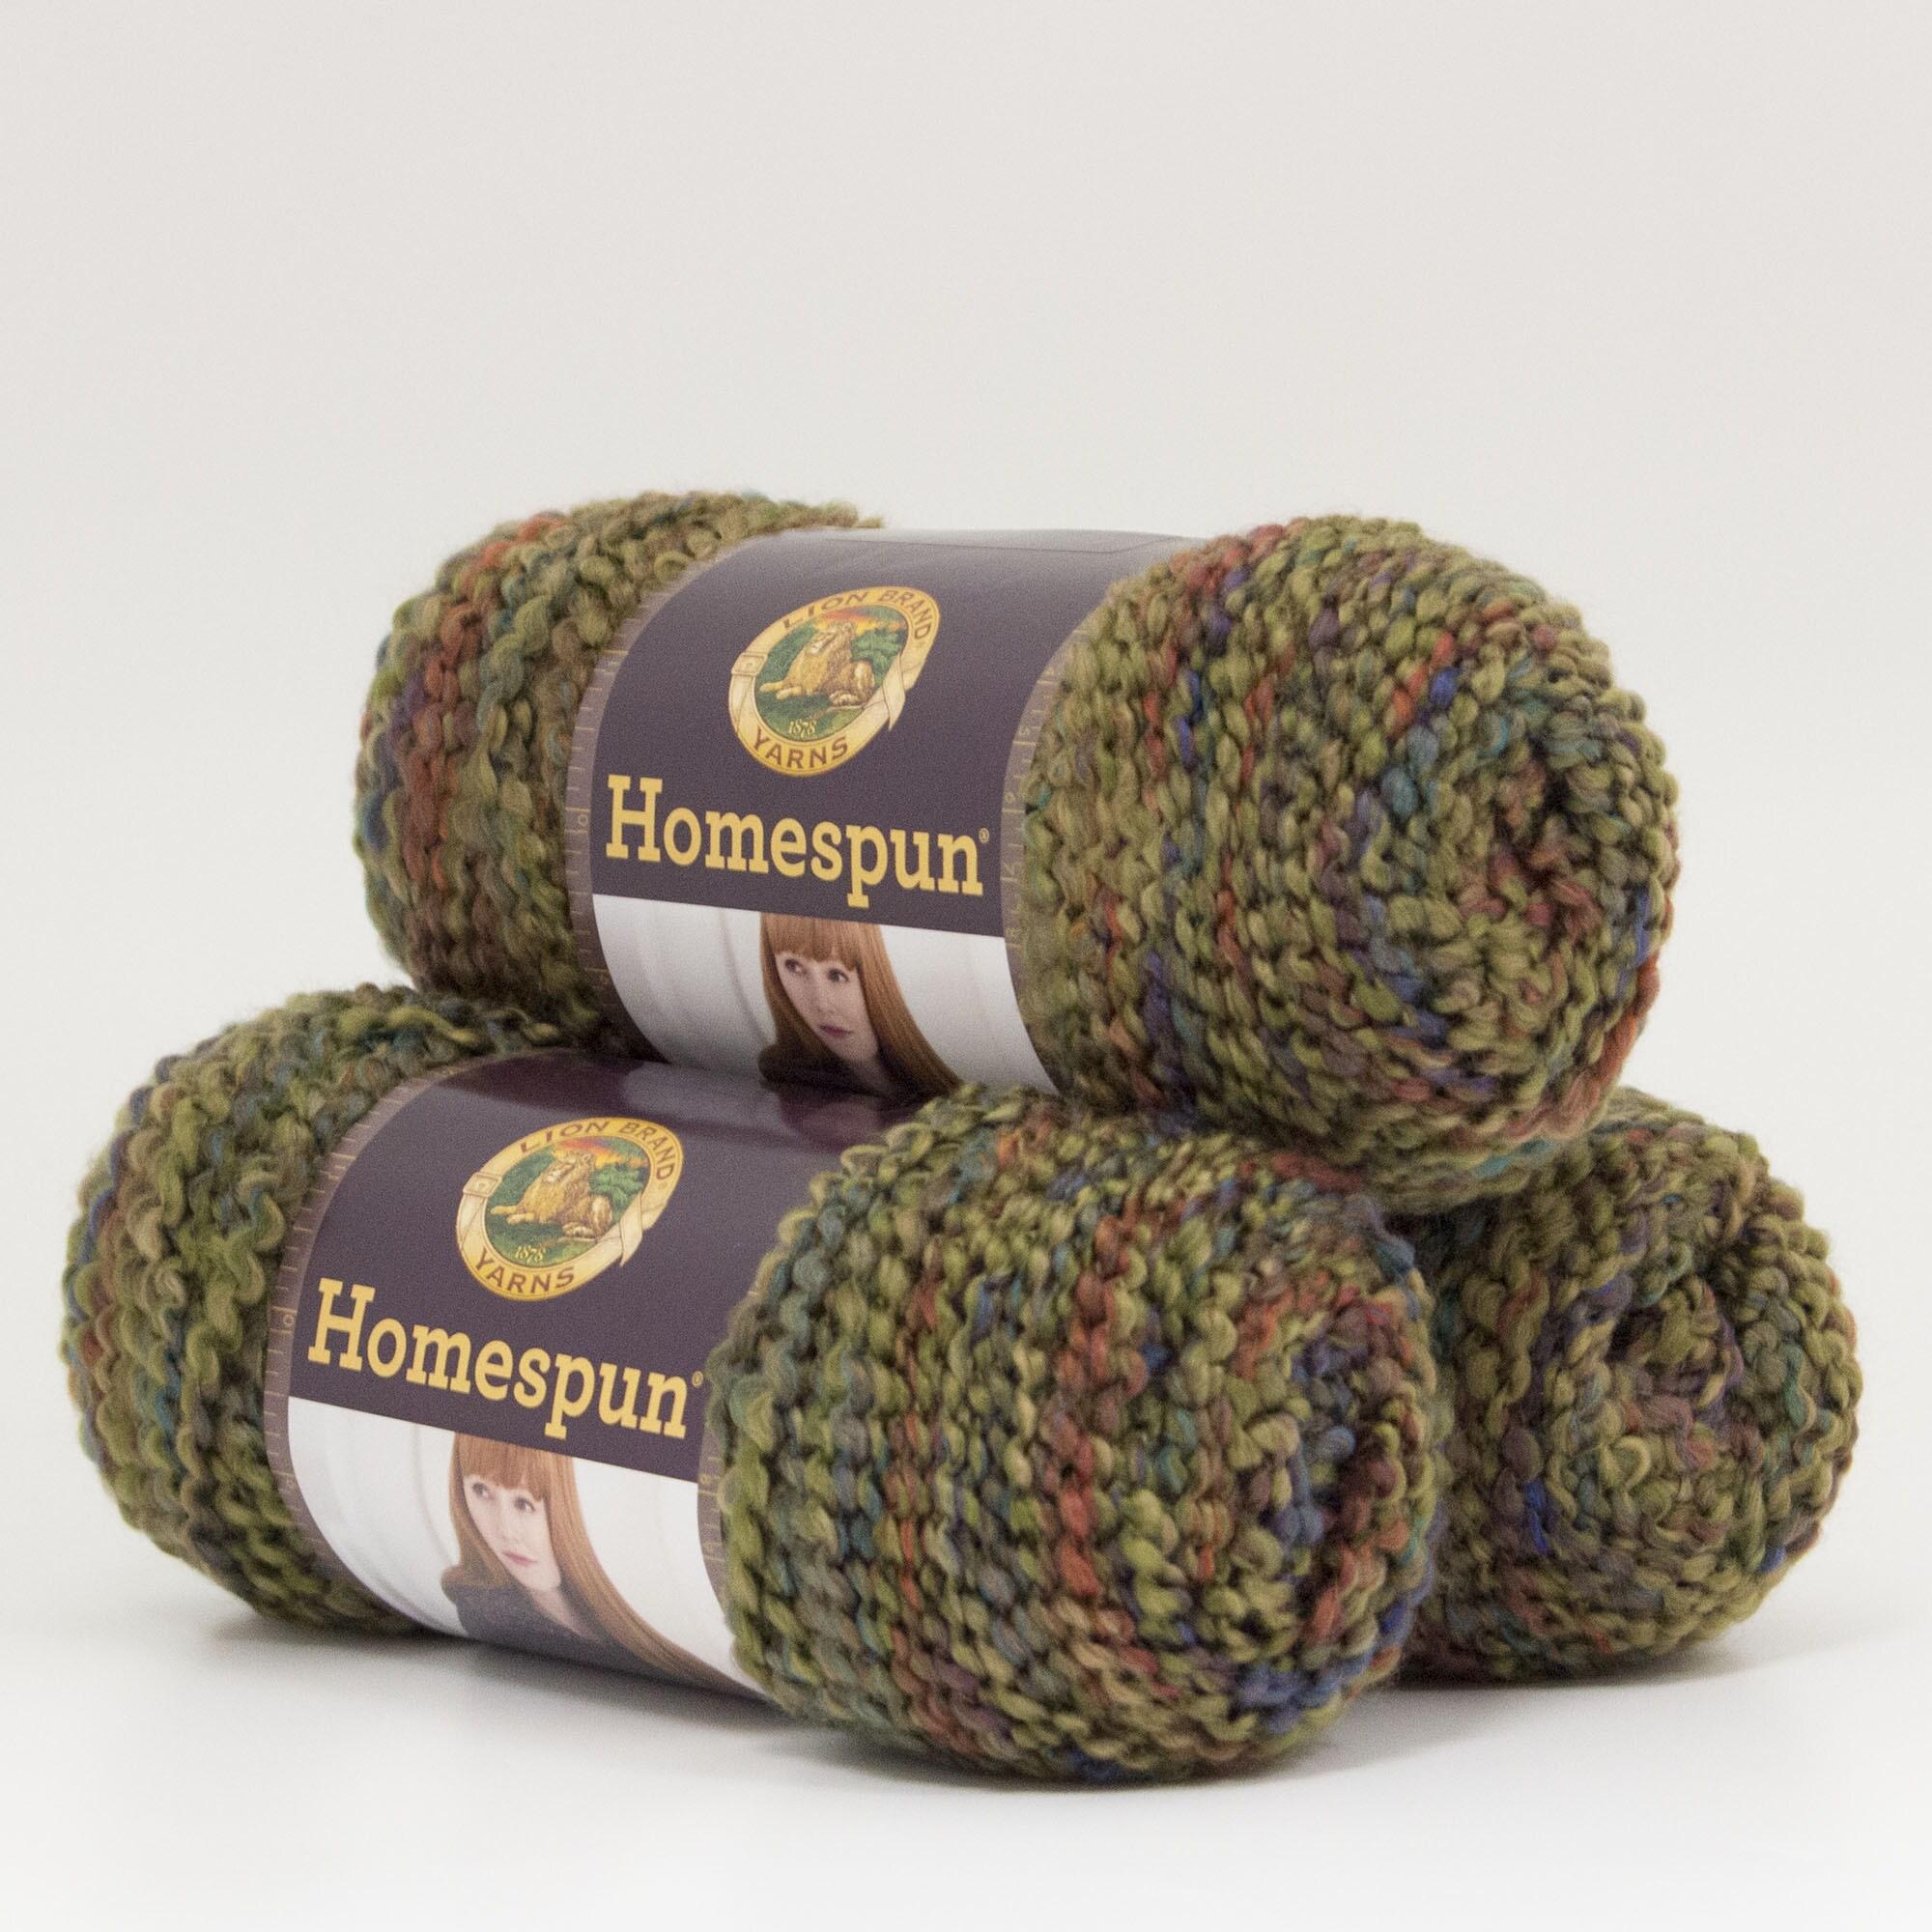 Shop Lion Brand Yarn Homespun Prairie 790 335 3 Pack Fashion Yarn